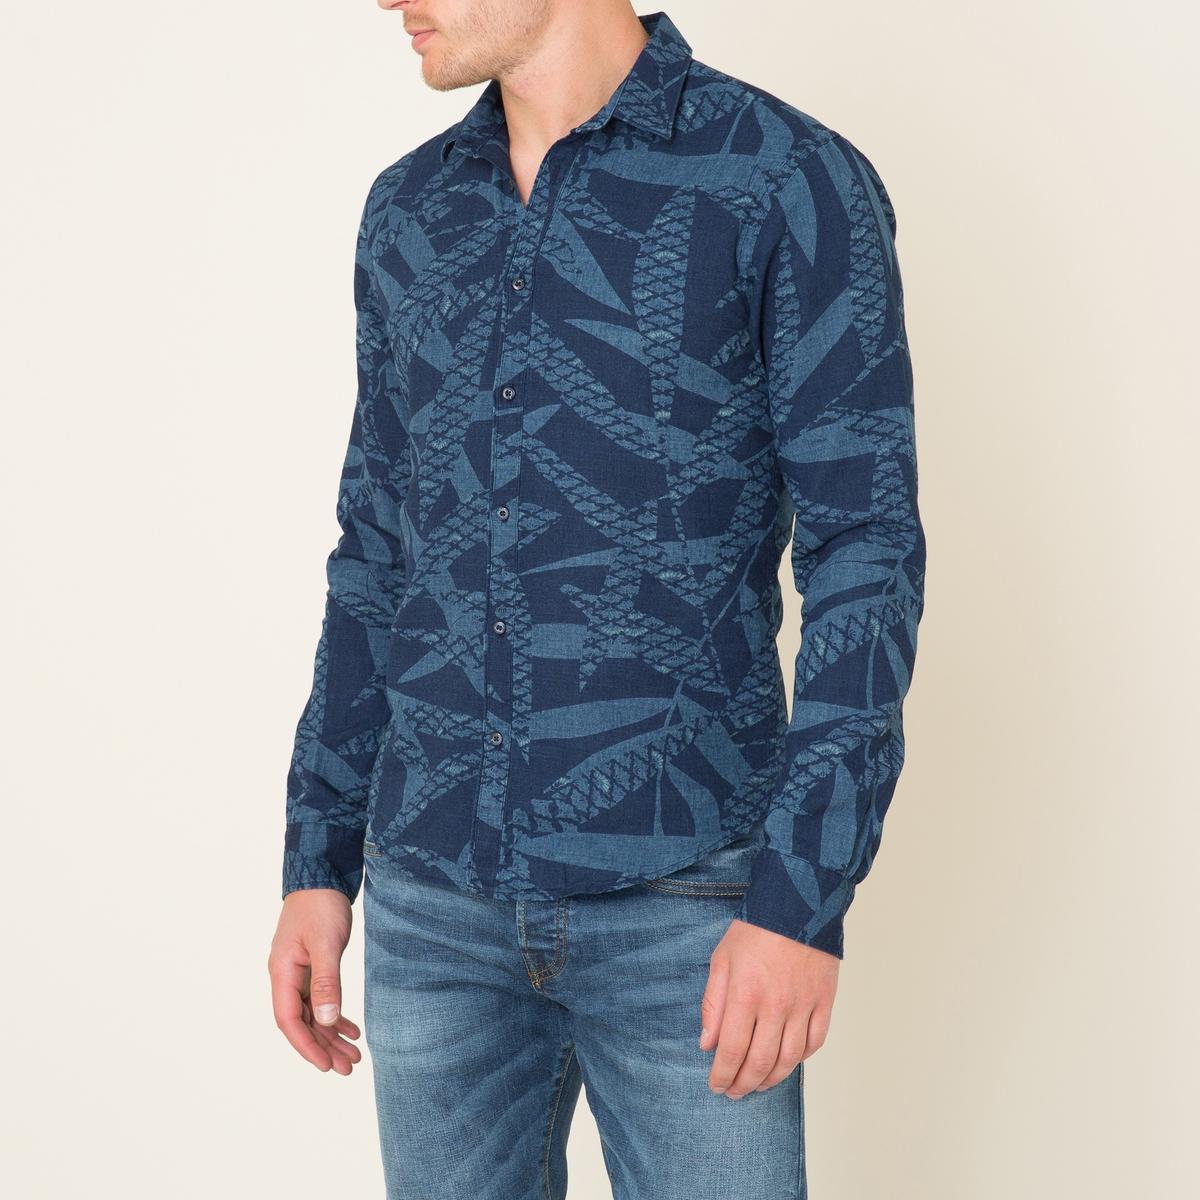 Рубашка из льна и хлопкаСостав и описание Материал : 55% льна, 45% хлопкаМарка : SCOTCH AND SODA<br><br>Цвет: темно-синий